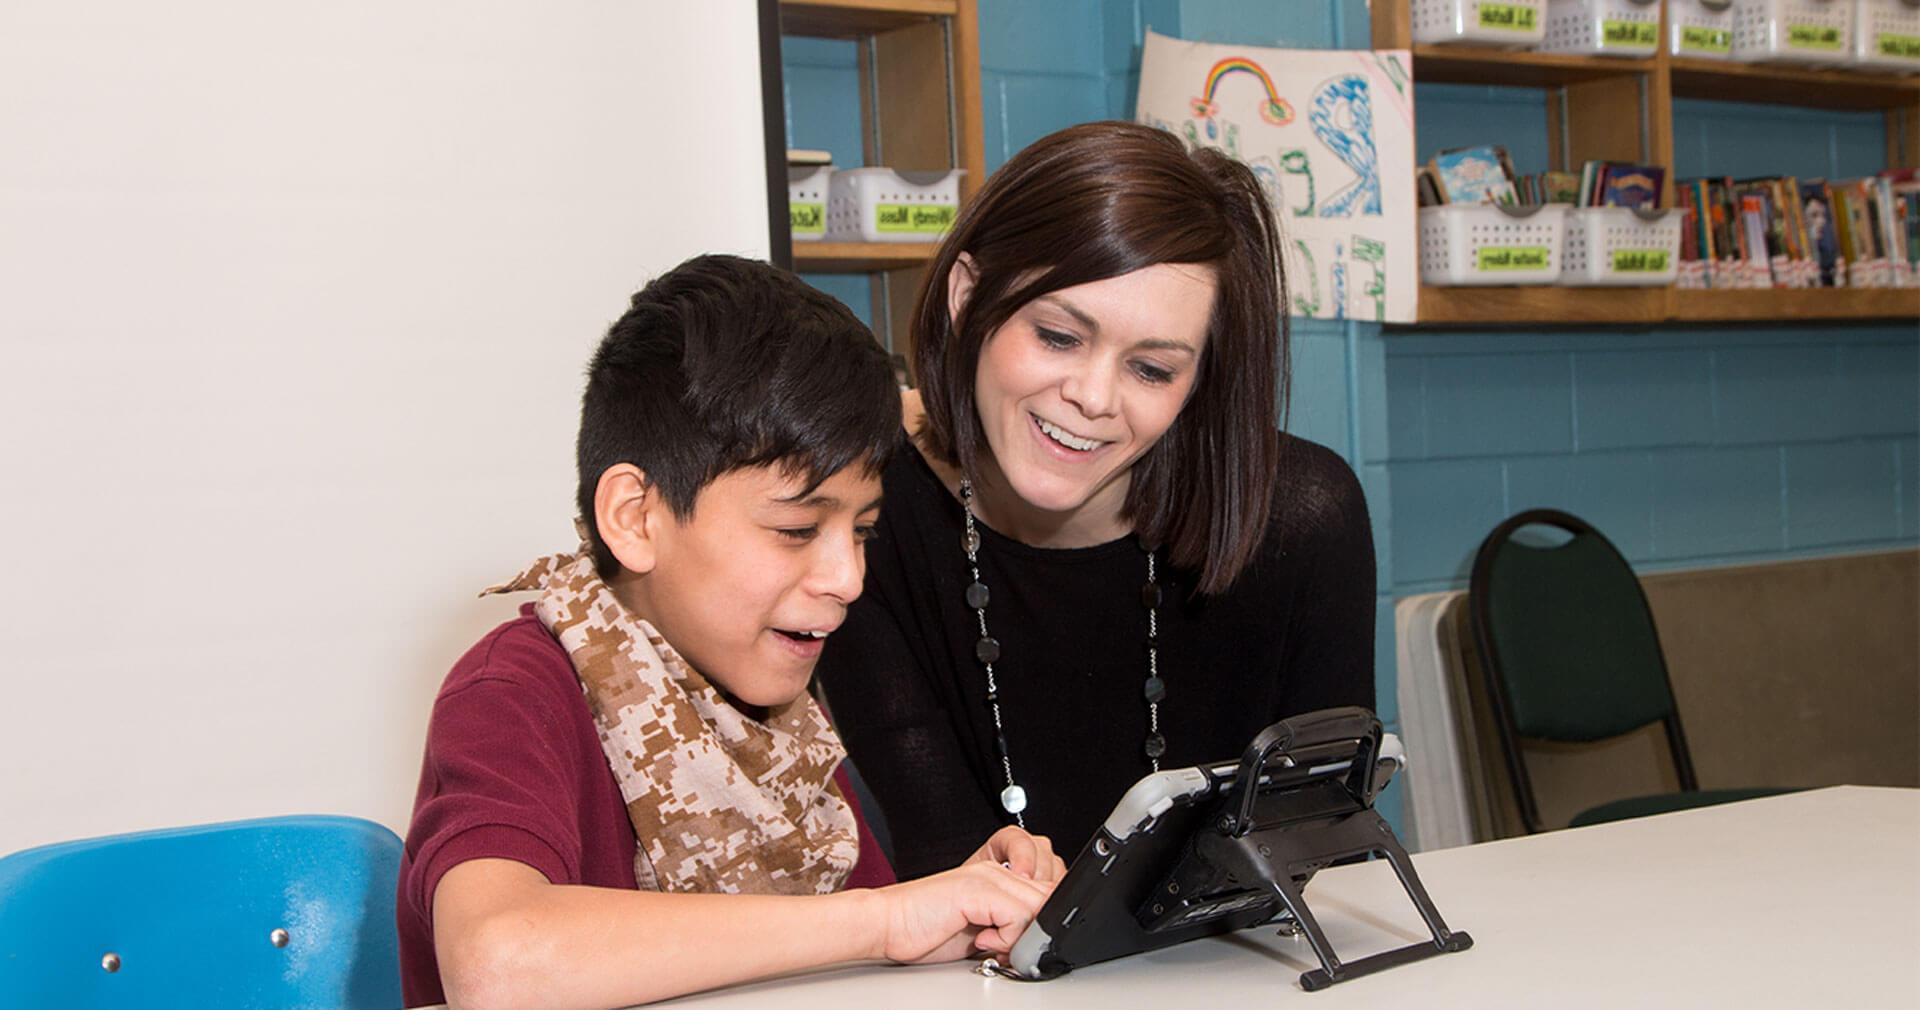 woman tutoring child